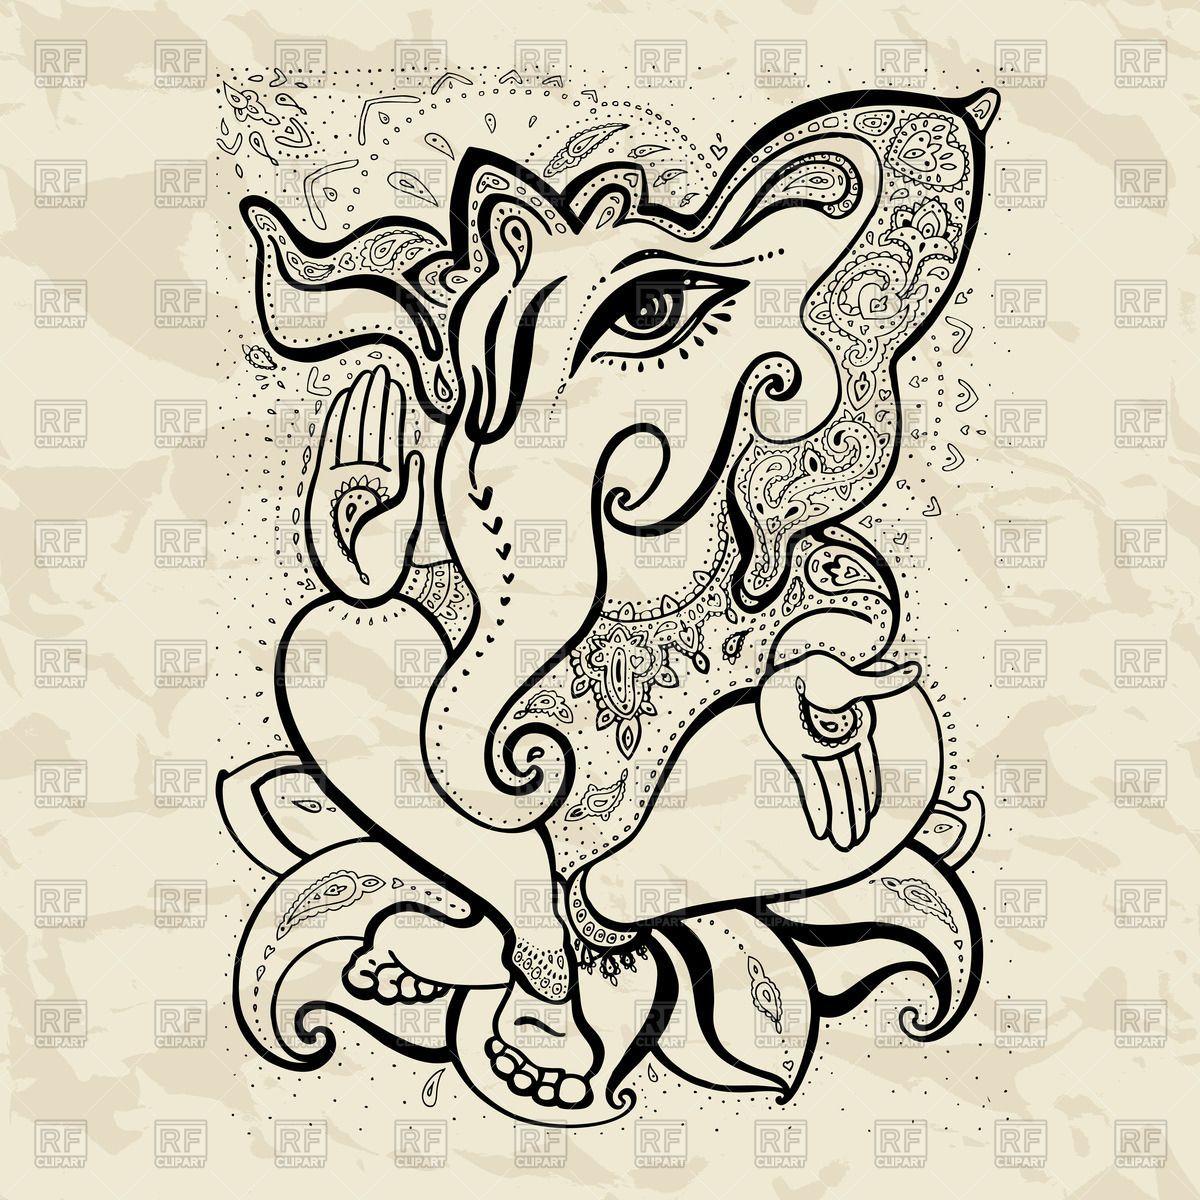 Hindu God Ganesha drawing with henna Vector Image | Hindus ...